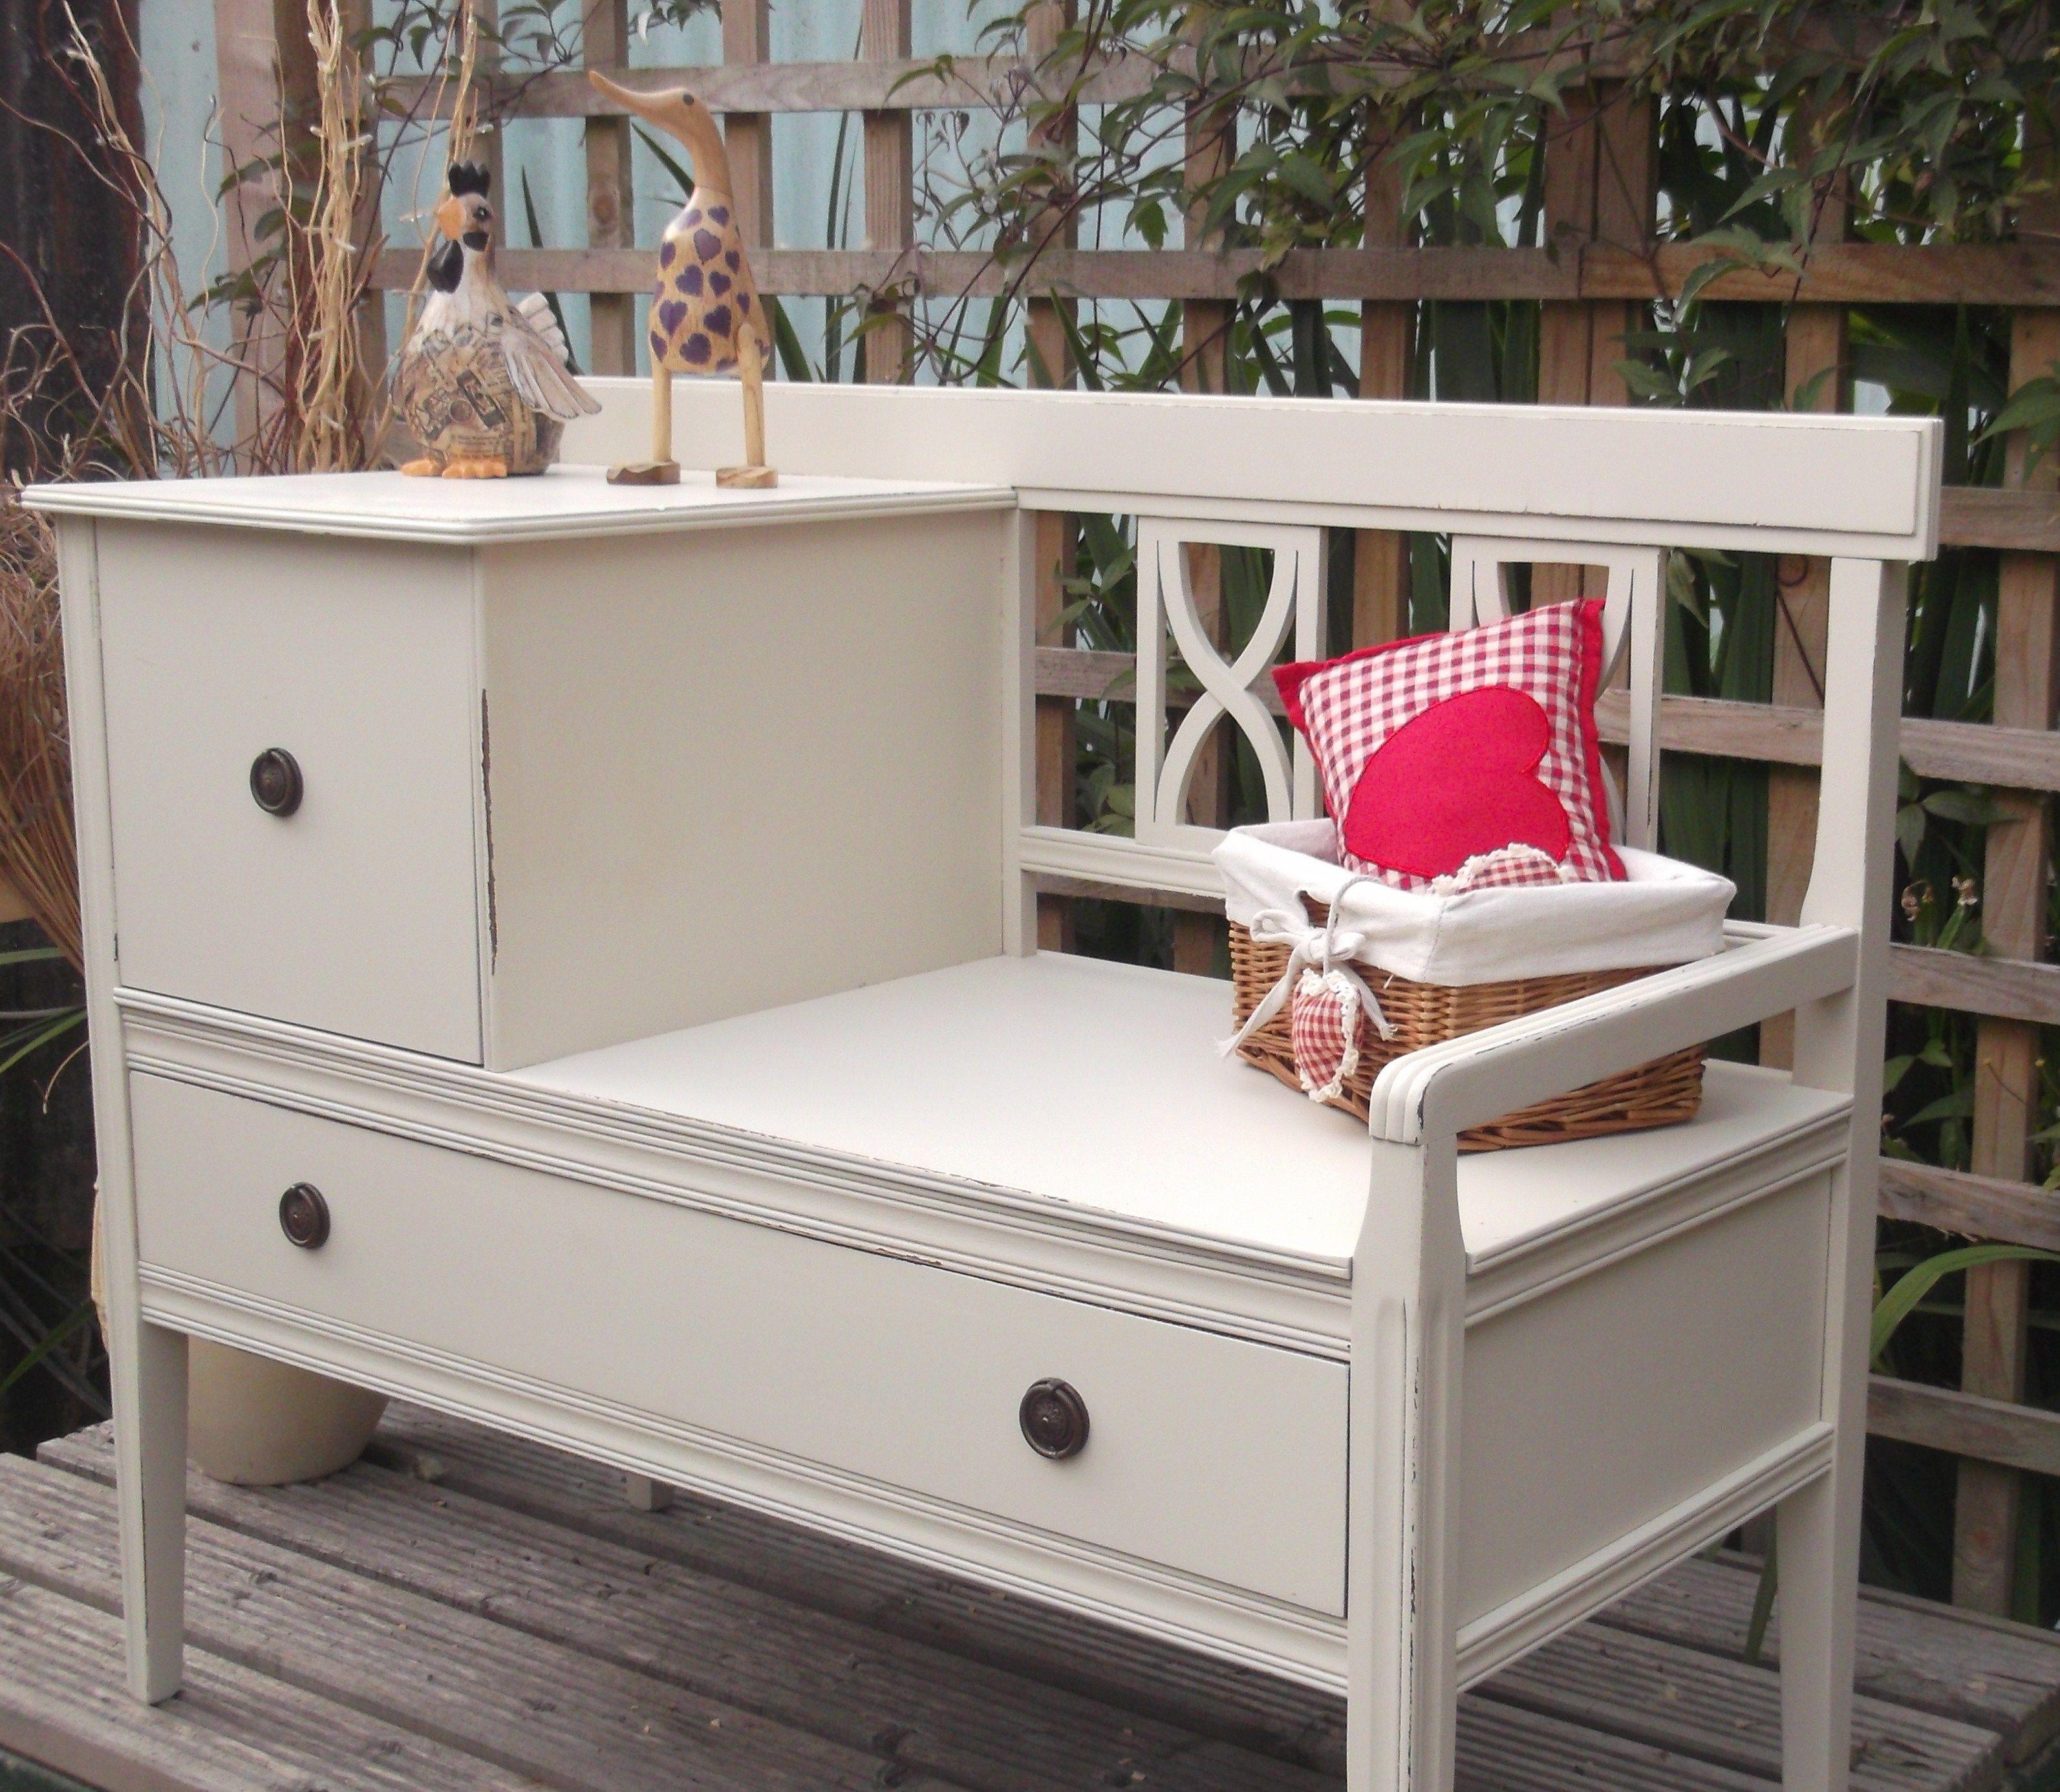 Hallway furniture habitat  Vintage hall tablebench more on the website  ART AND DIY